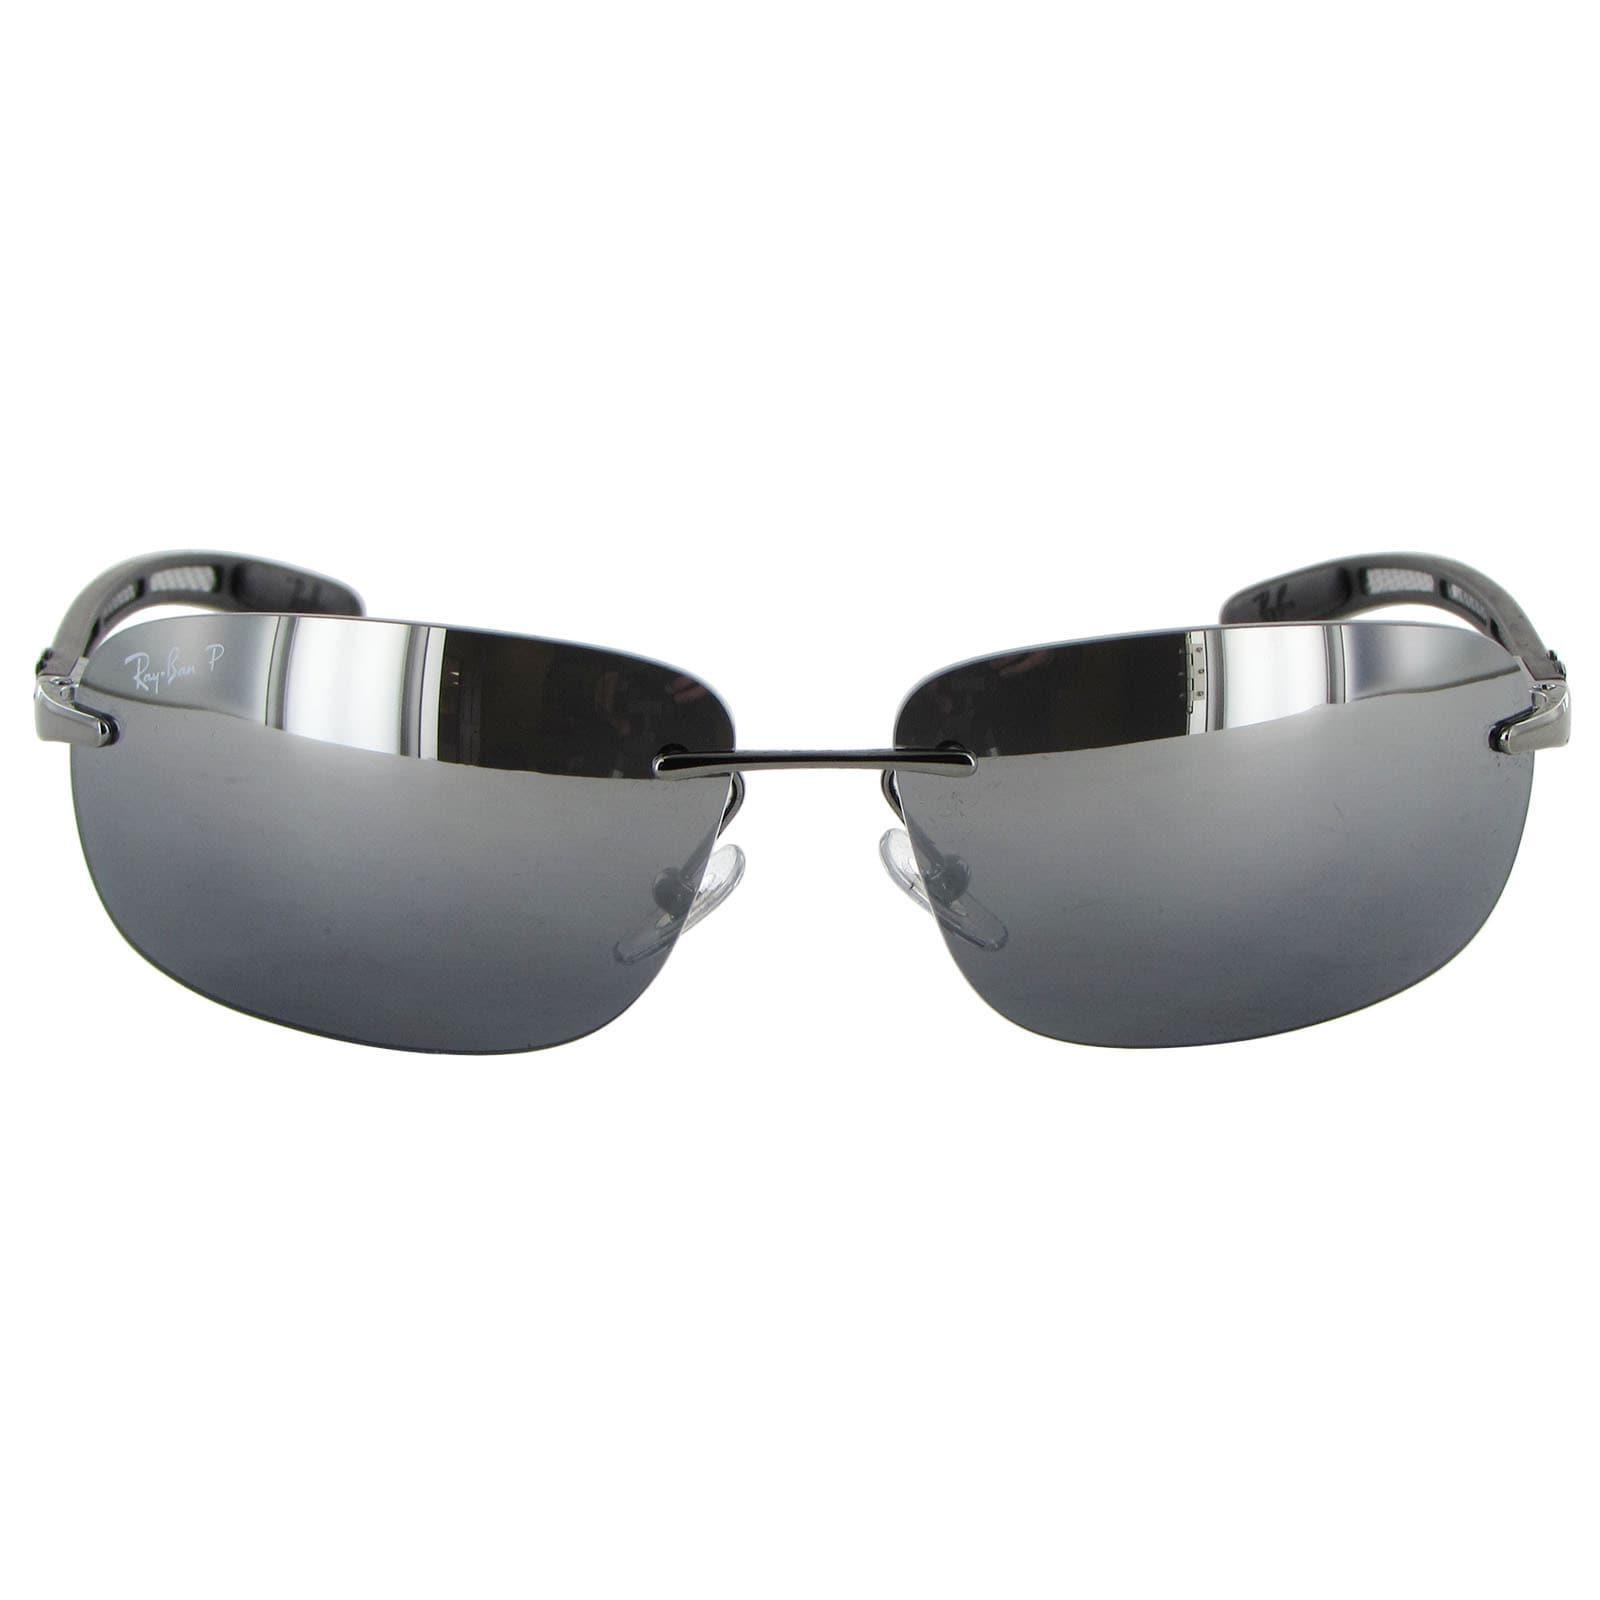 201ee1aecf Shop Ray Ban Tech Carbon Fibre 8303 Mens Silver Frame Black Polarized Lens  Sunglasses - Free Shipping Today - Overstock - 15079250